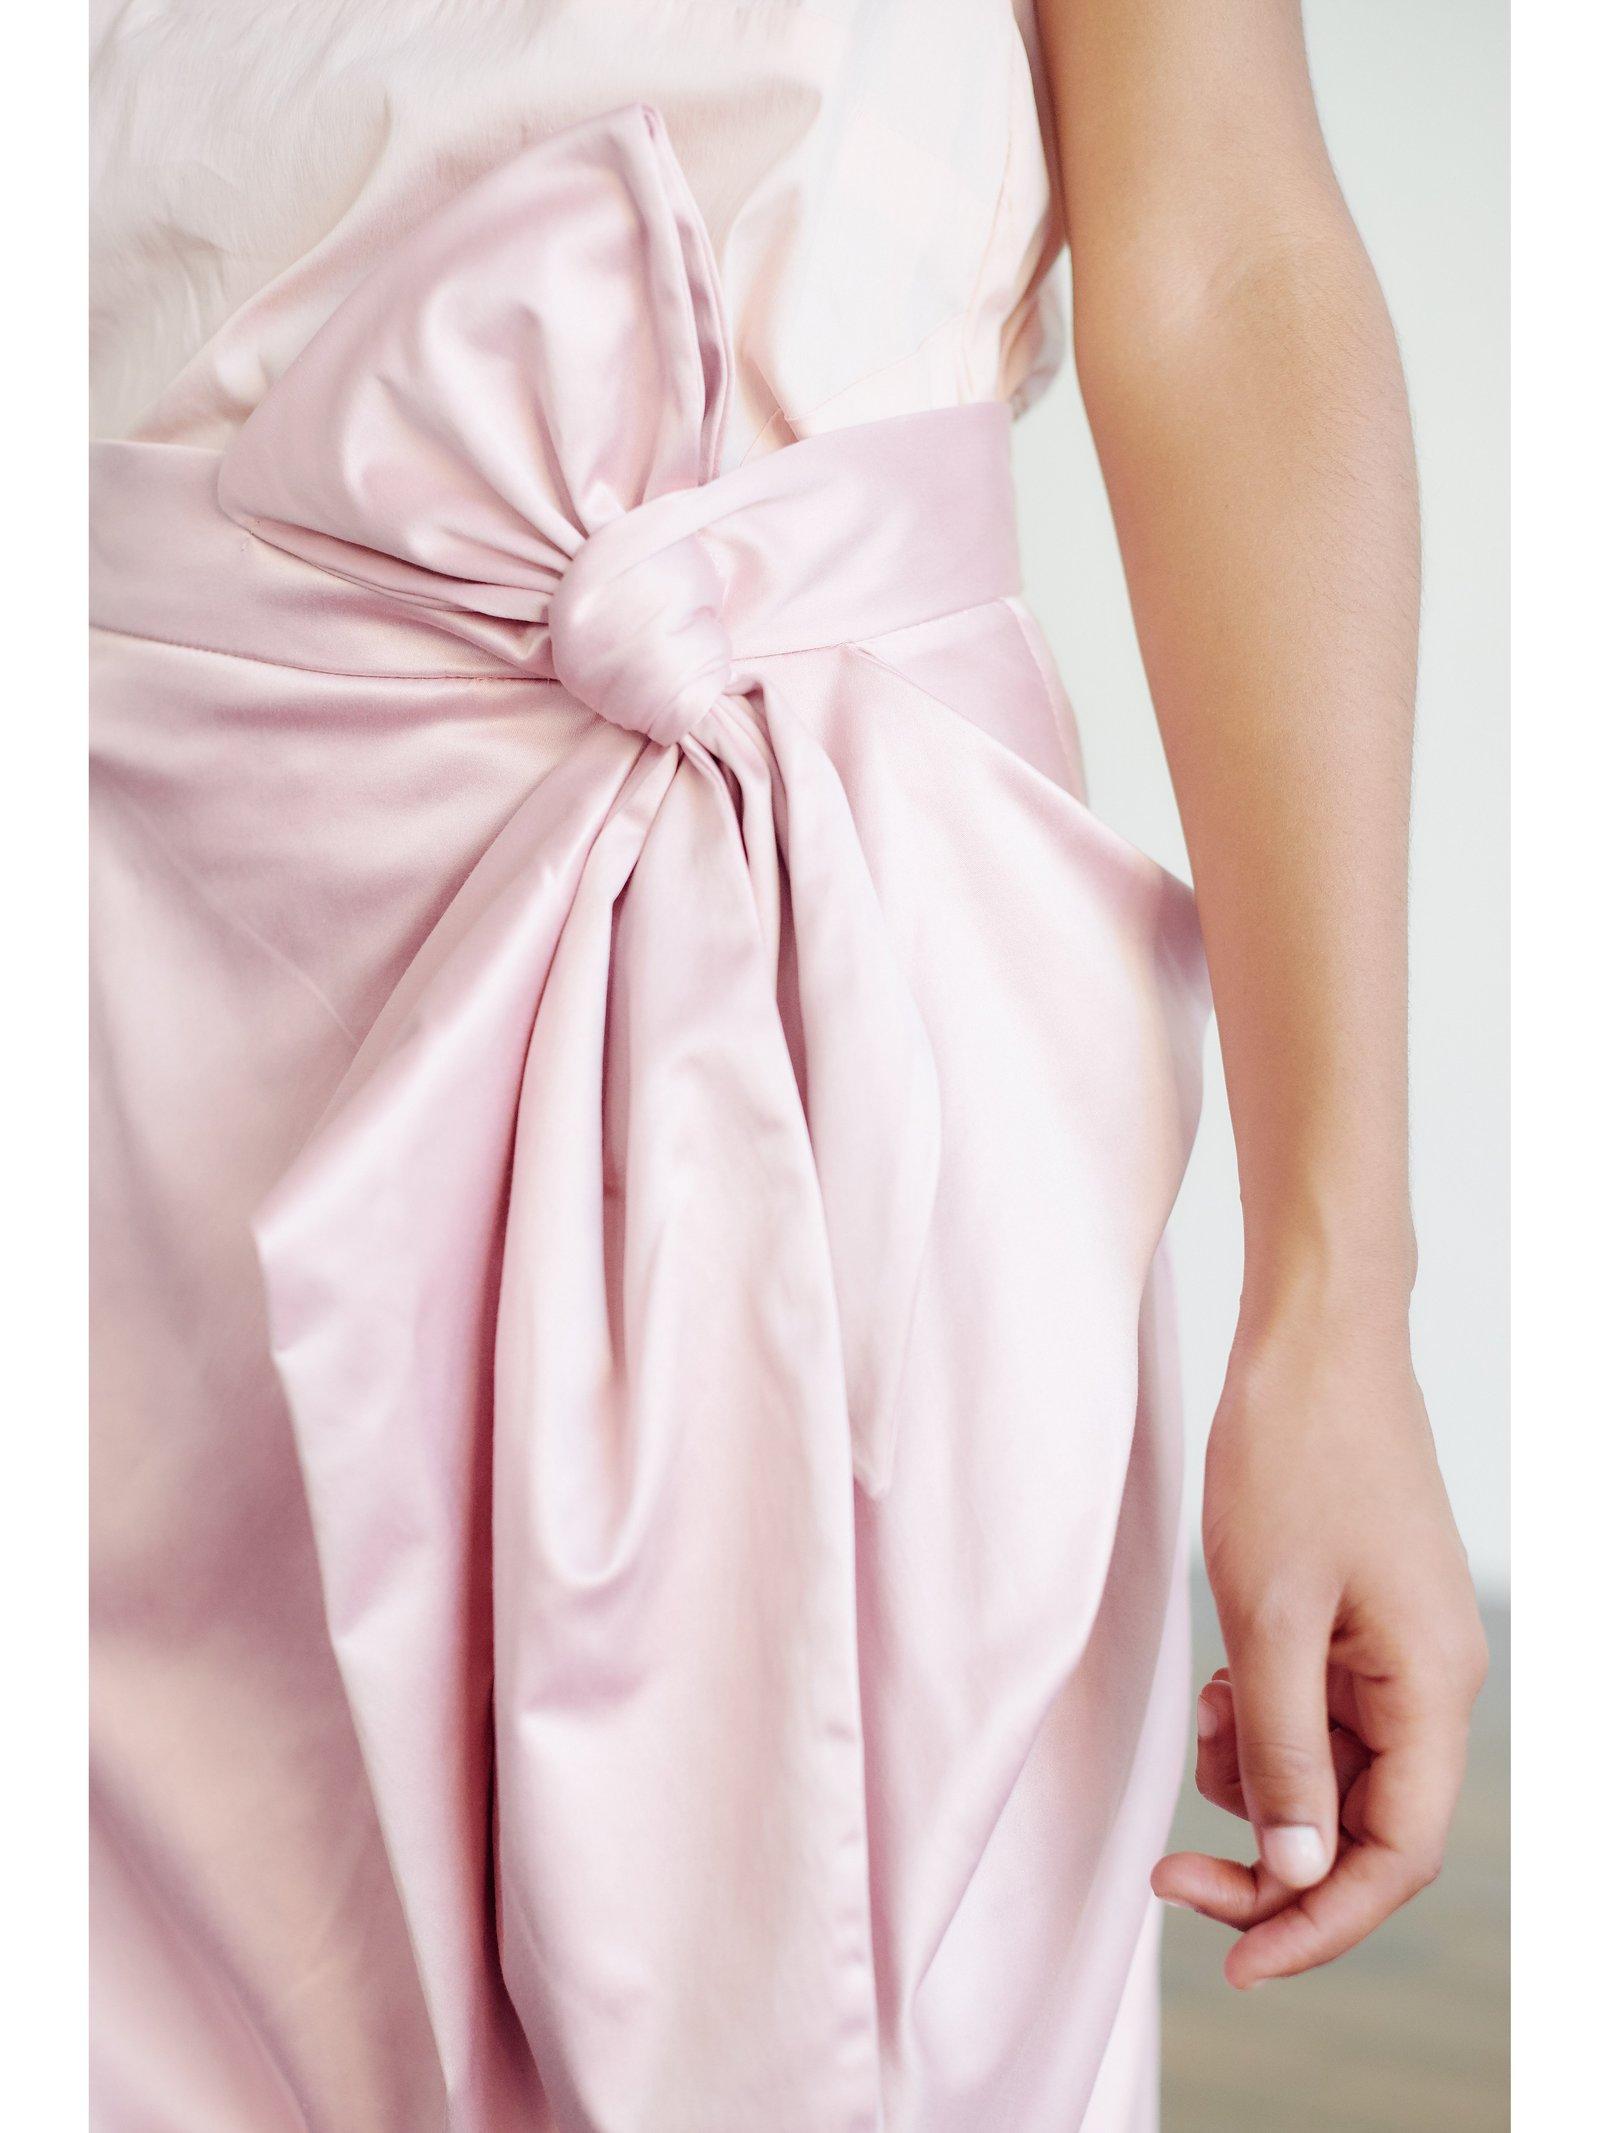 HB By Hanna Baranava Bow Skirt